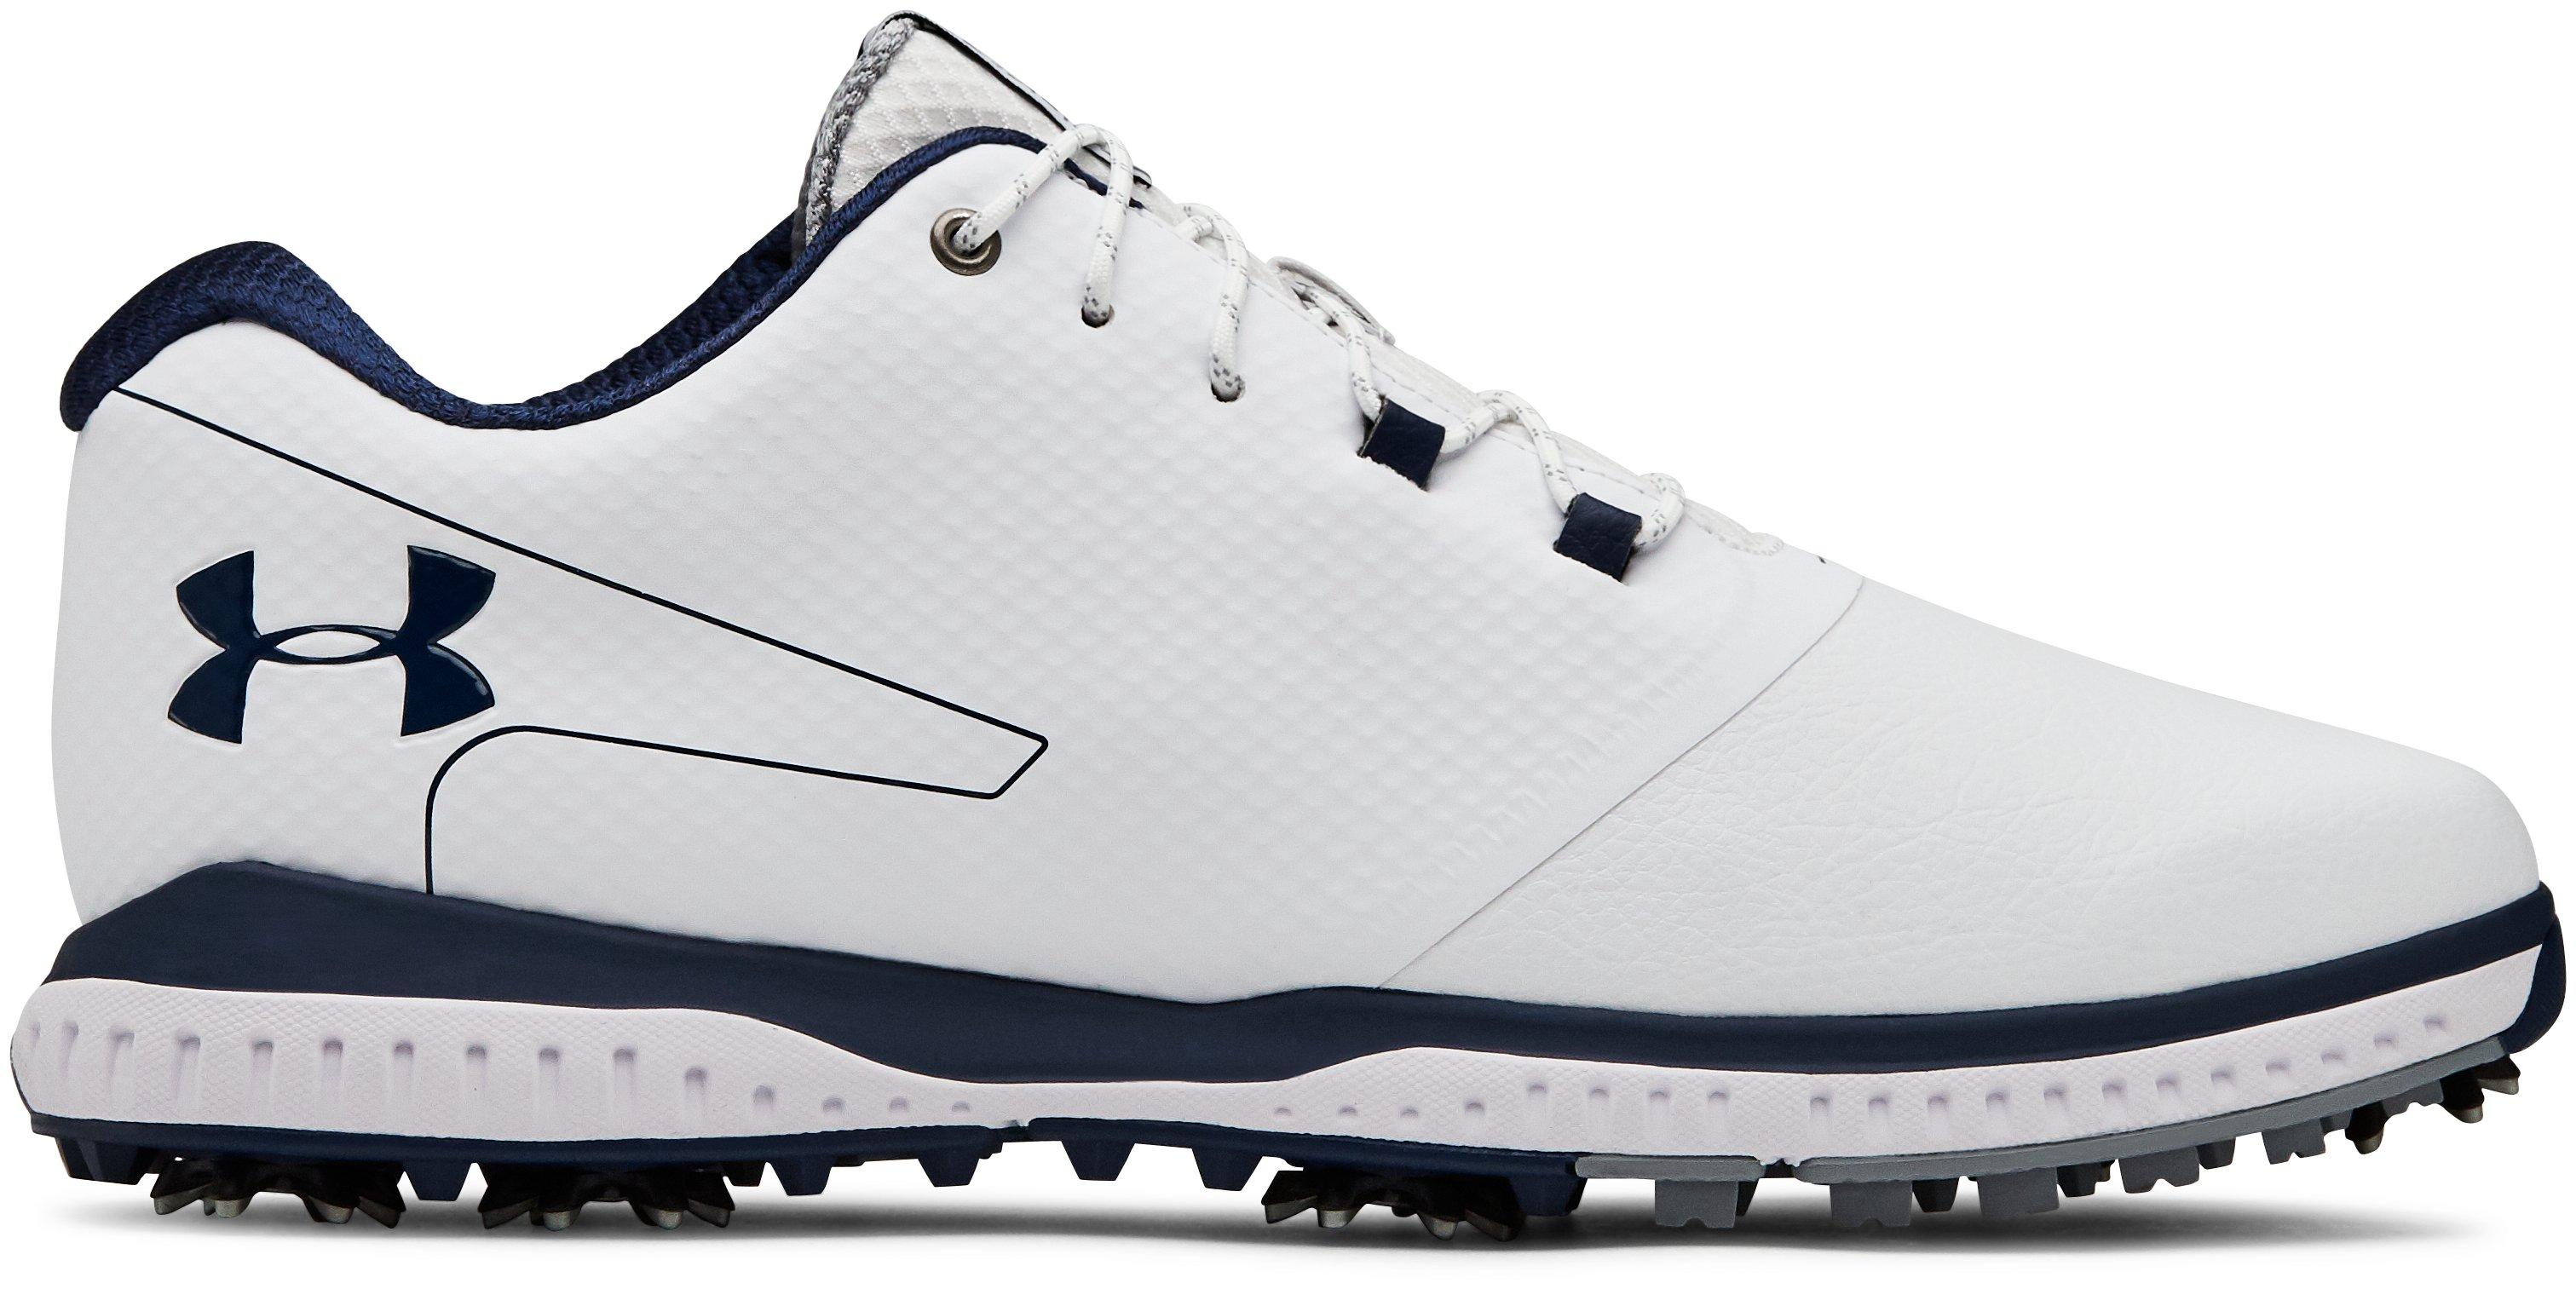 Men's UA Fade RST 2 Golf Shoes, 360 degree view